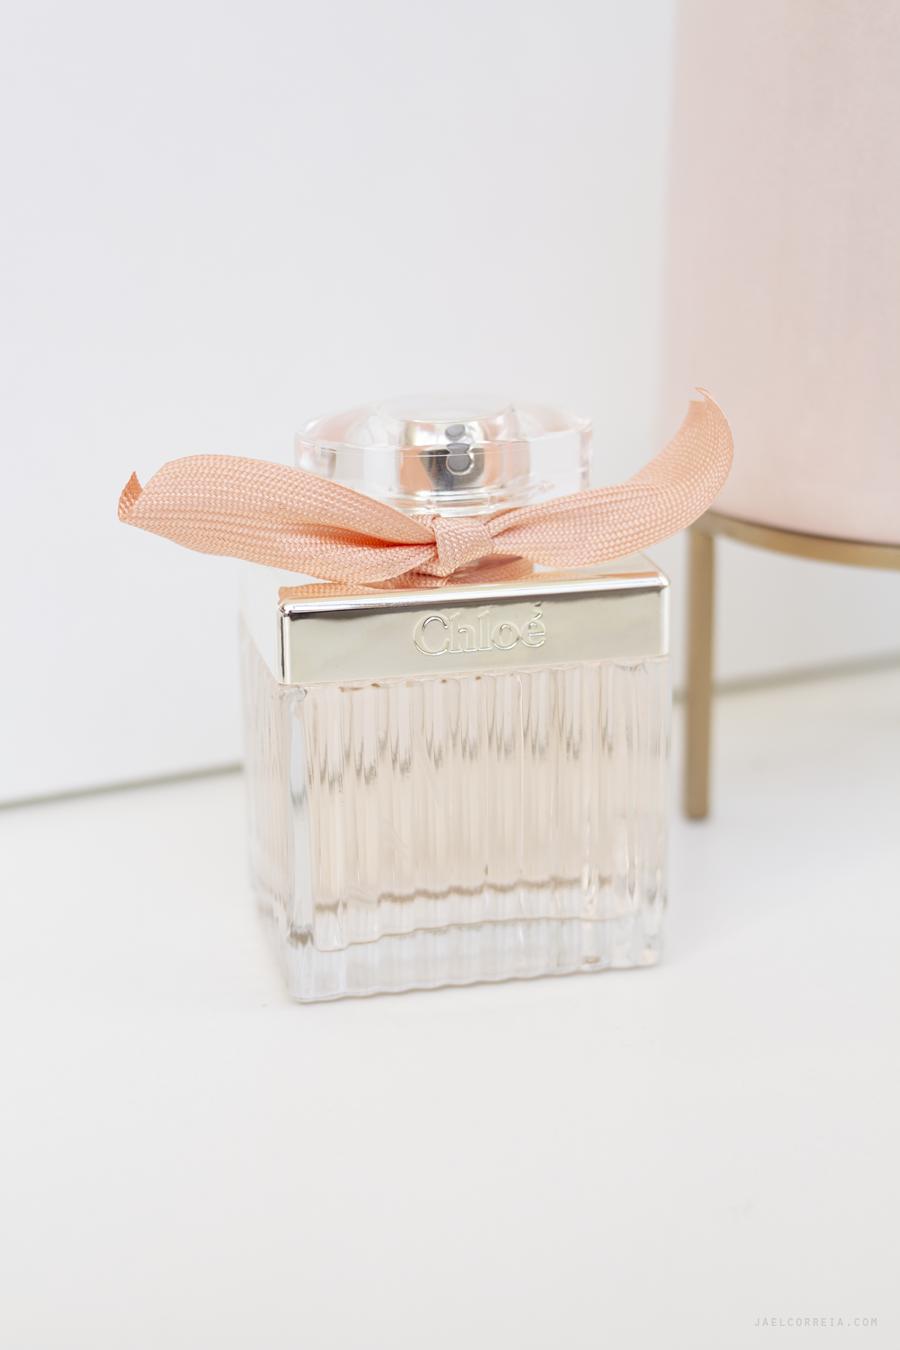 chloe rose tangerine eau de toilette edt perfume parfum 2020 review portugal loja online notino perfumes baratos jael correia